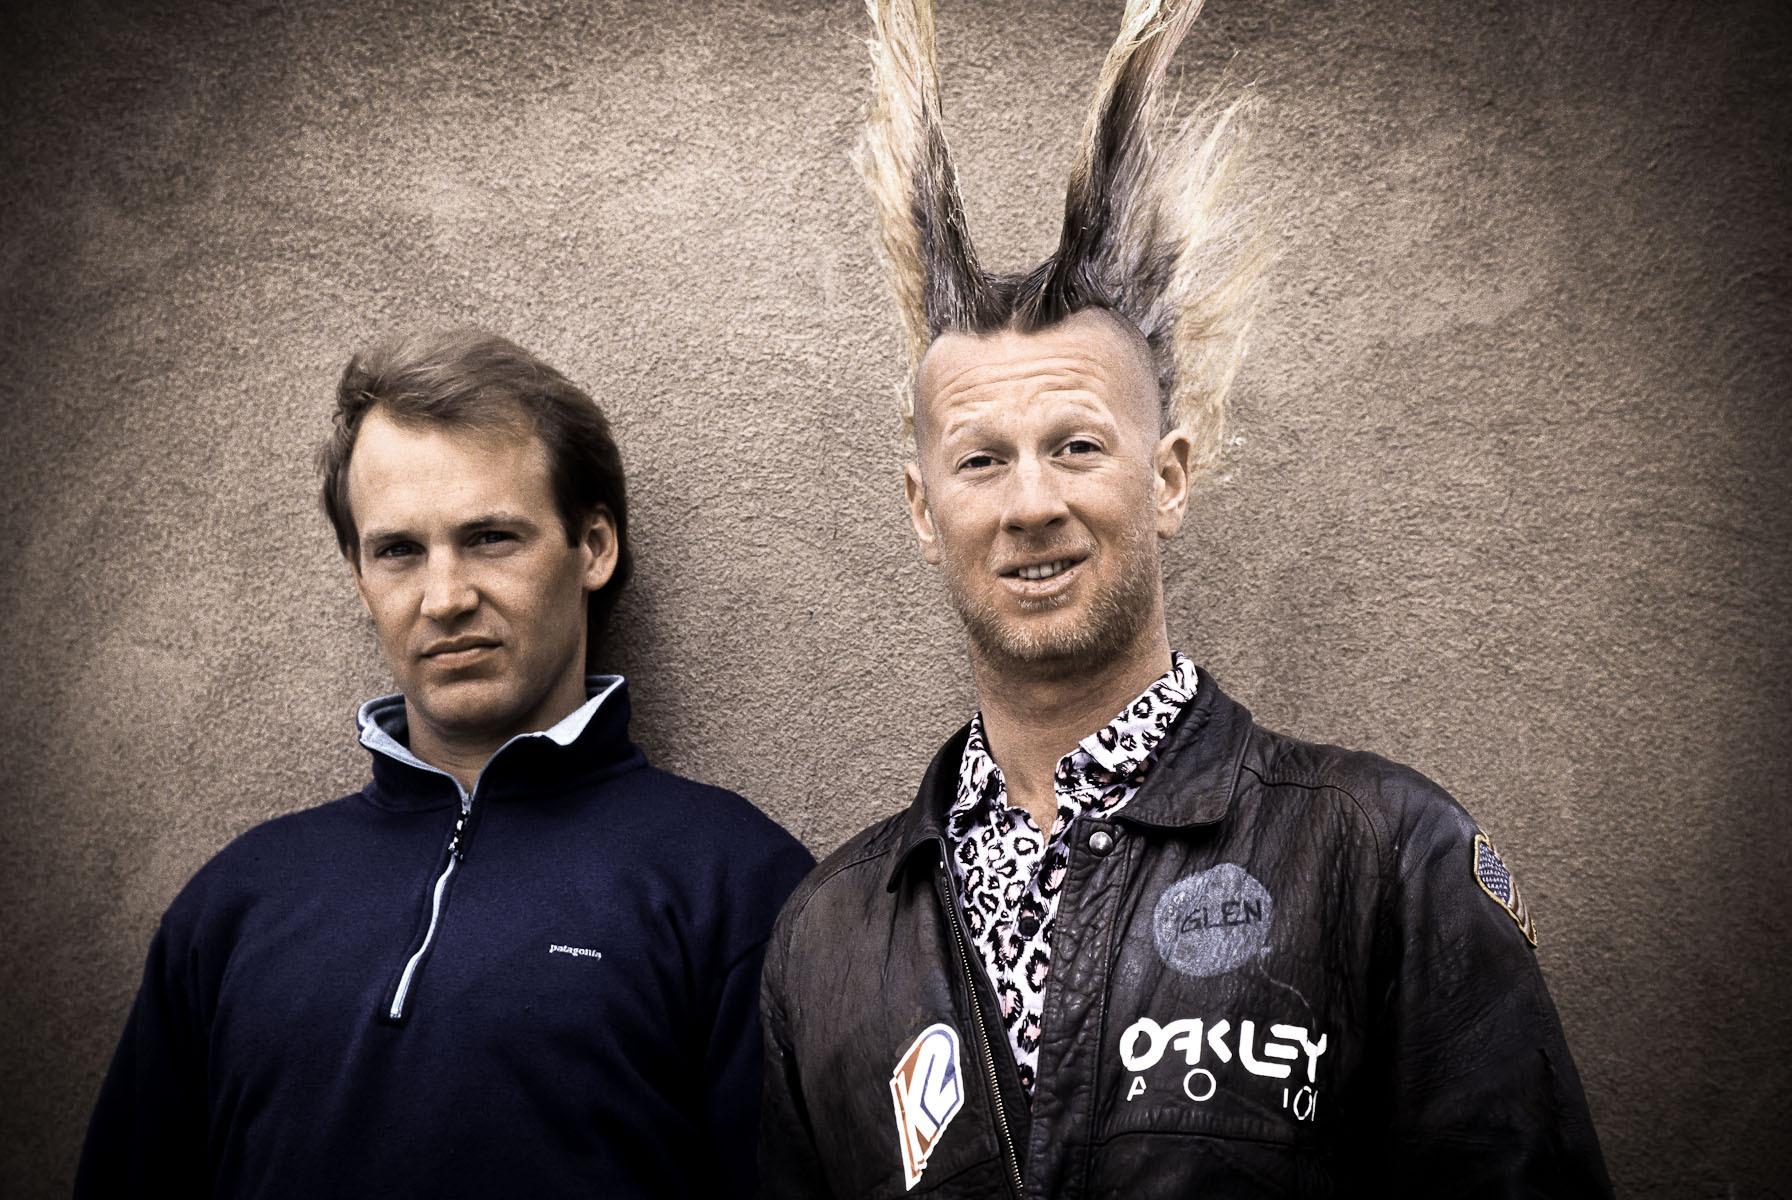 Glen Plake and Mike Hattrup